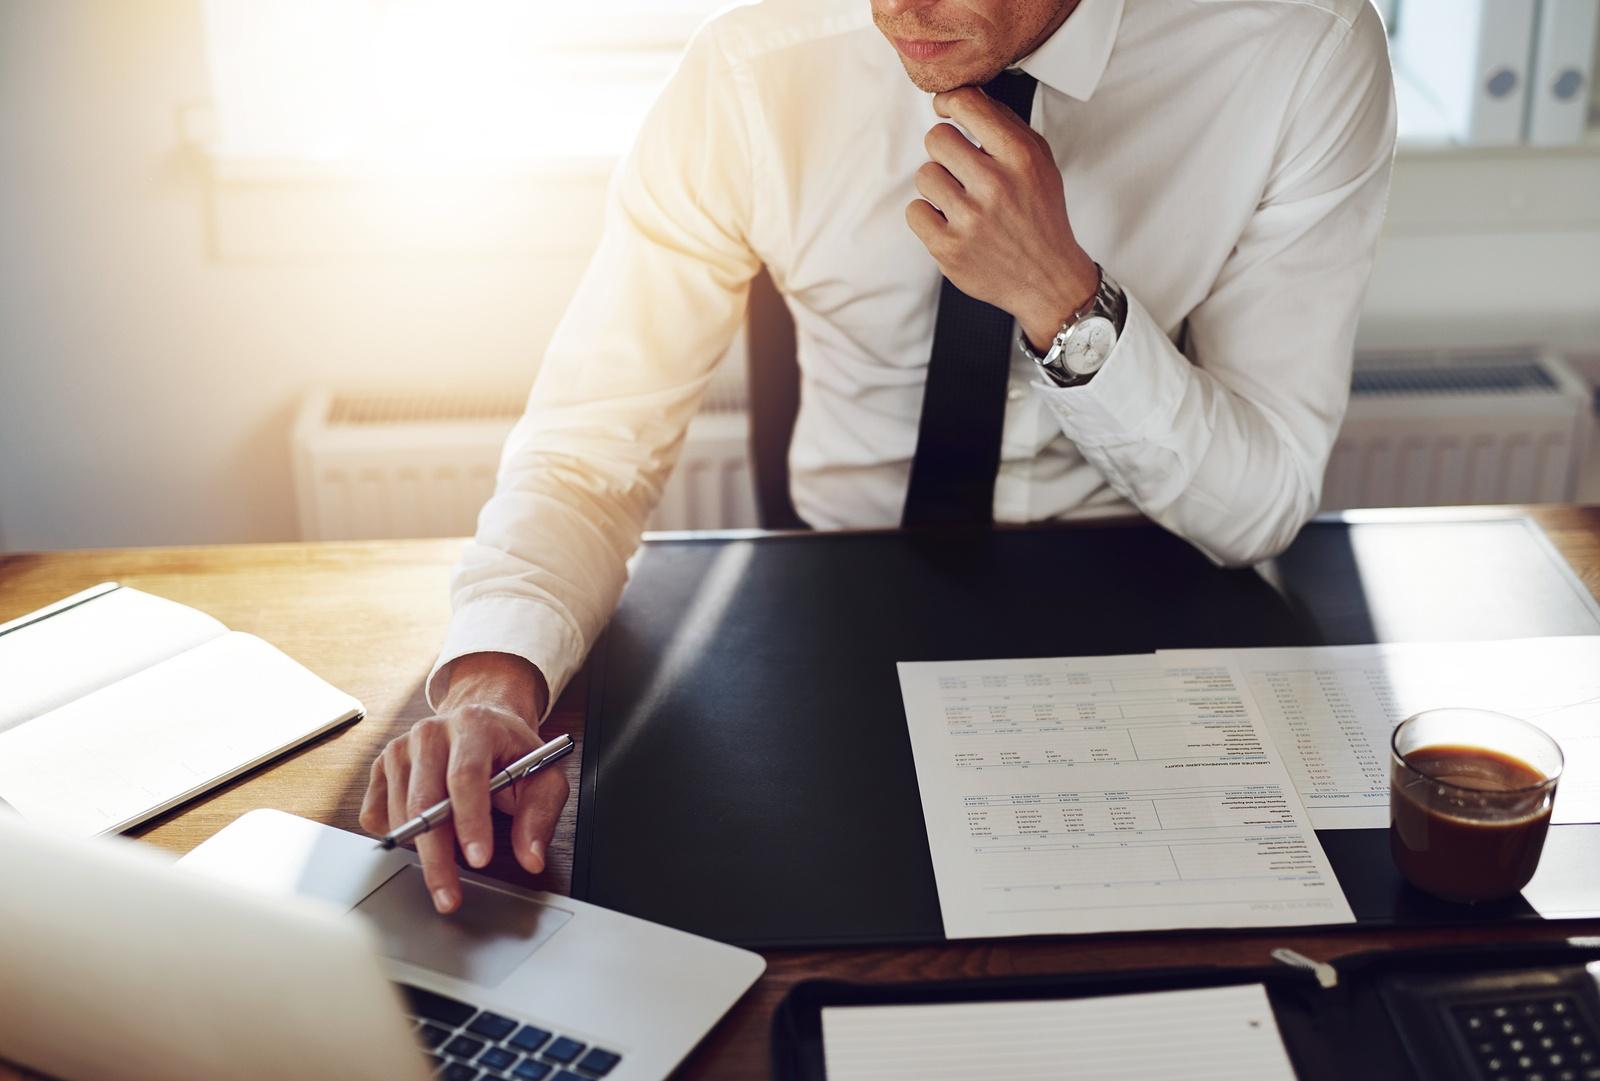 bigstock-Business-Man-Working-At-Office-106691141.jpg